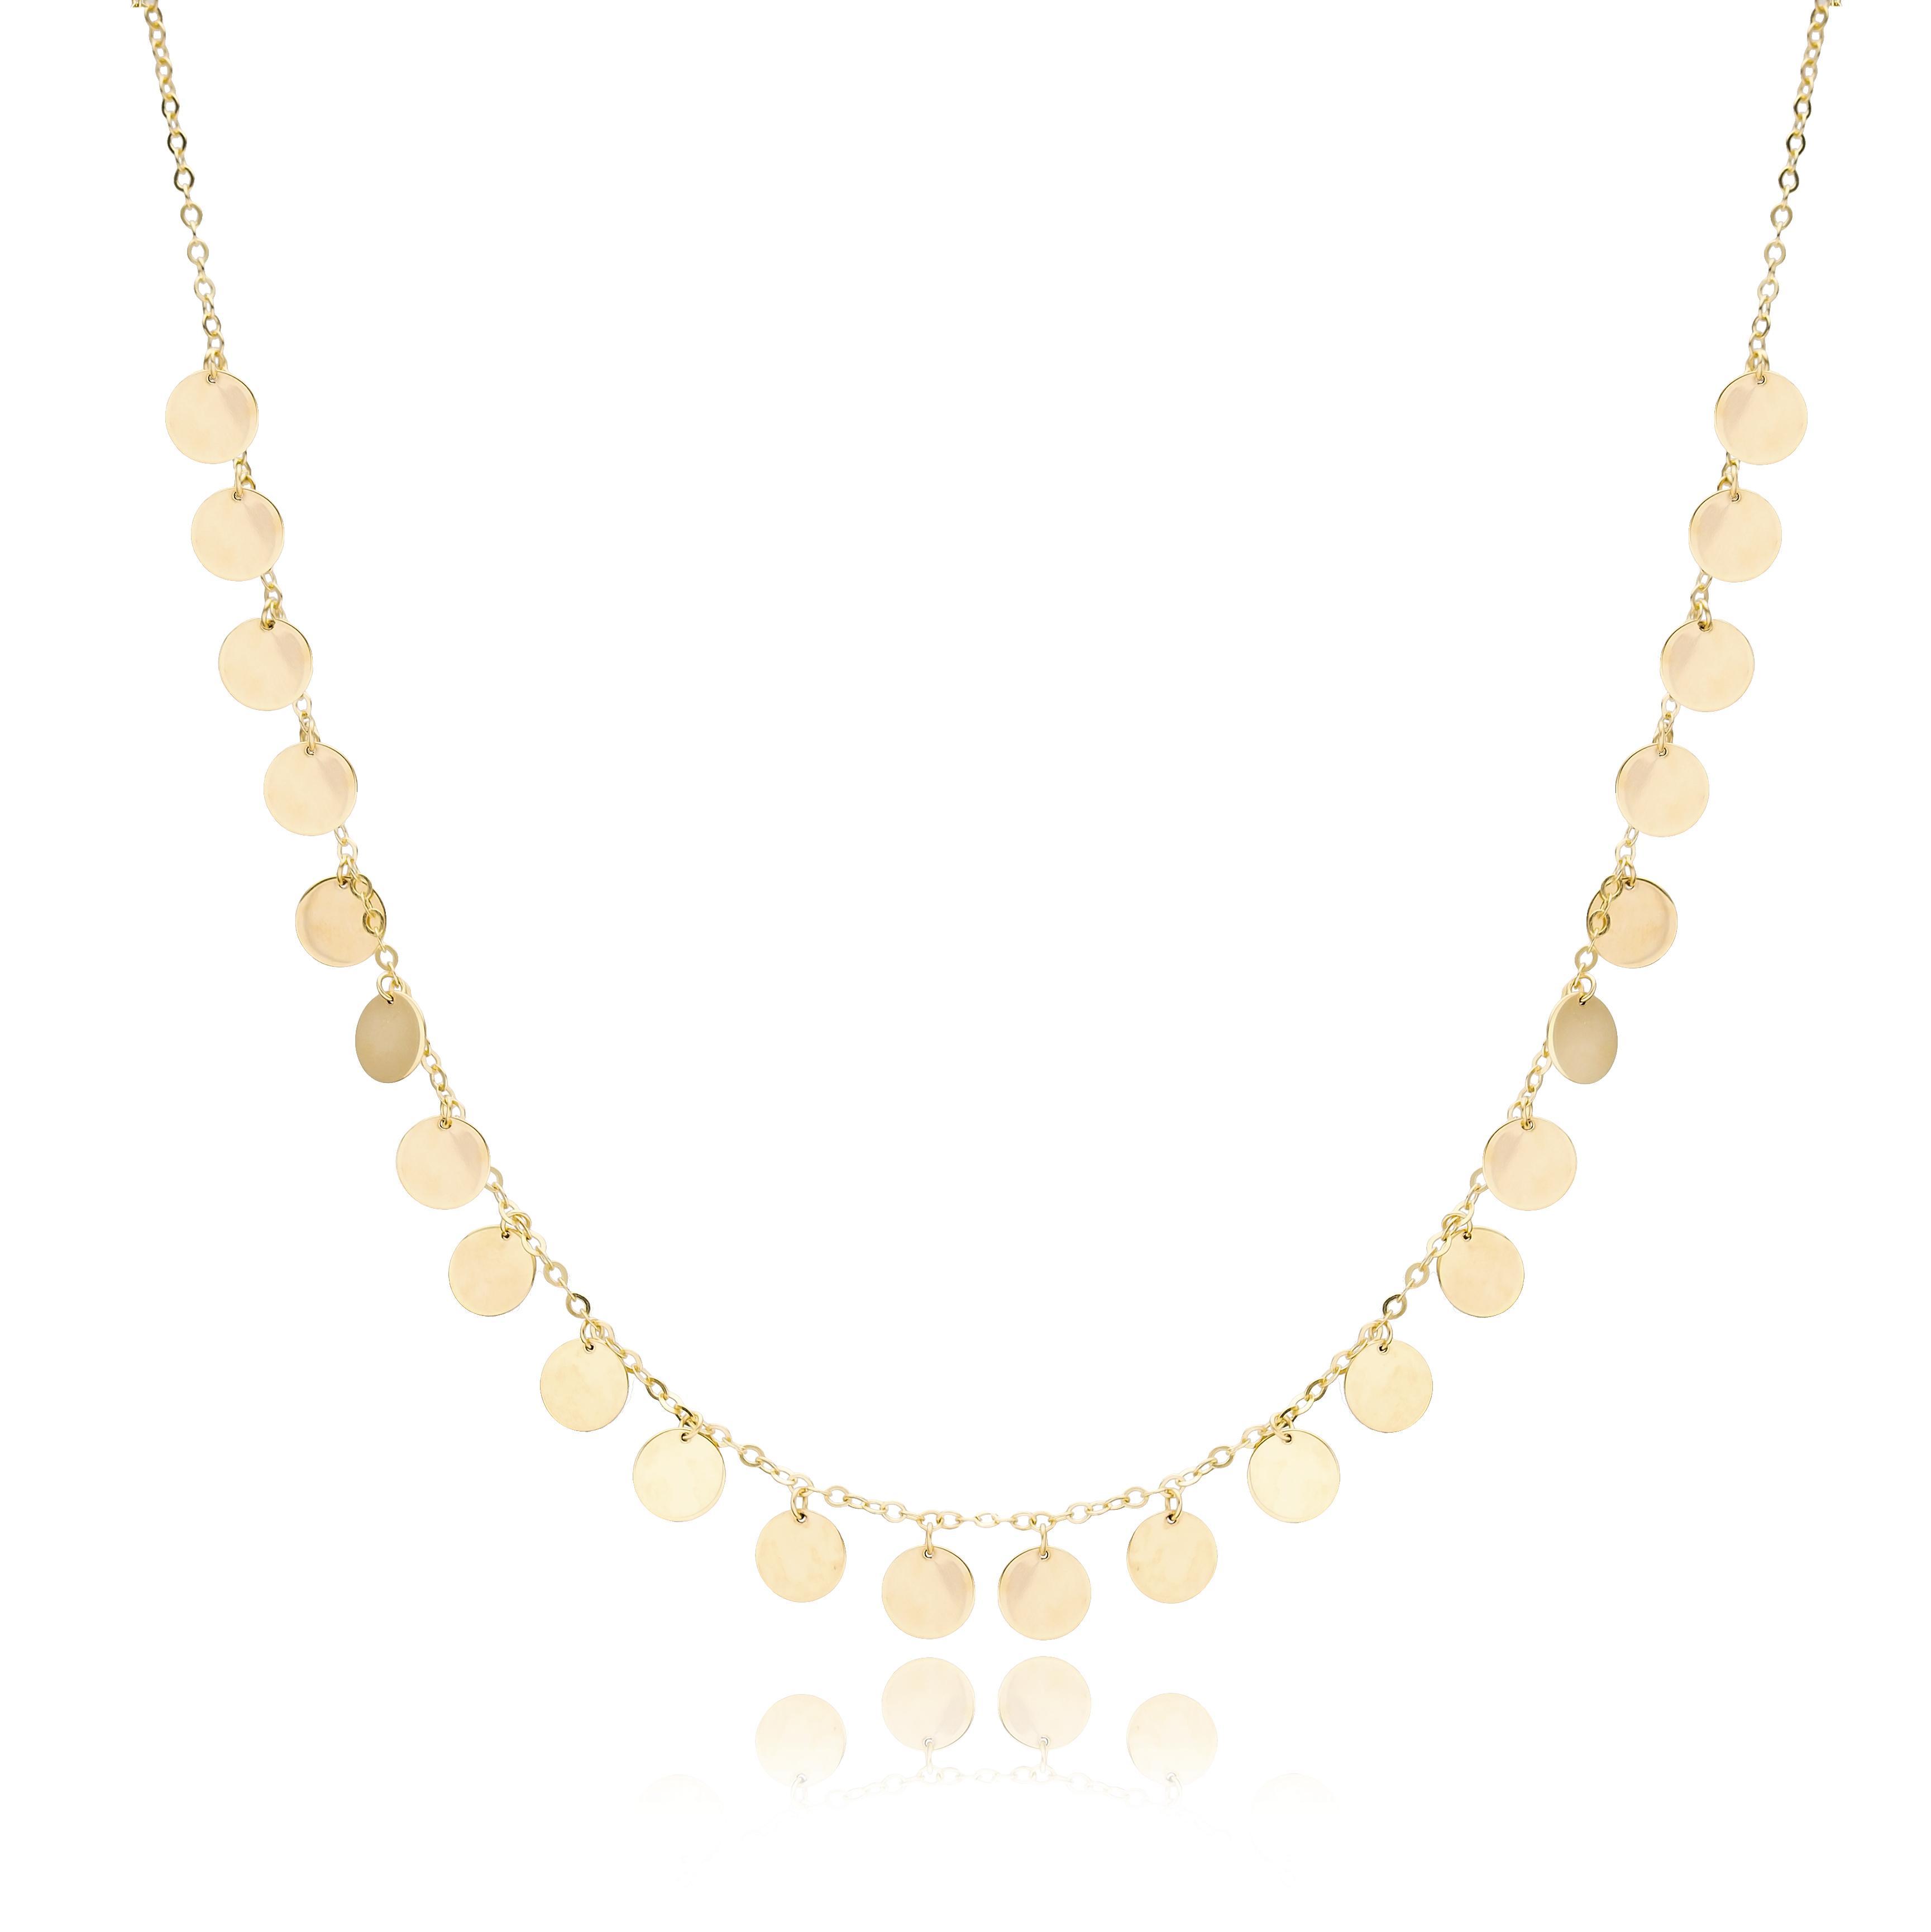 10K Gold Elegant Shaker Circle Pendant Wholesale Handmade Turkish Jewelry